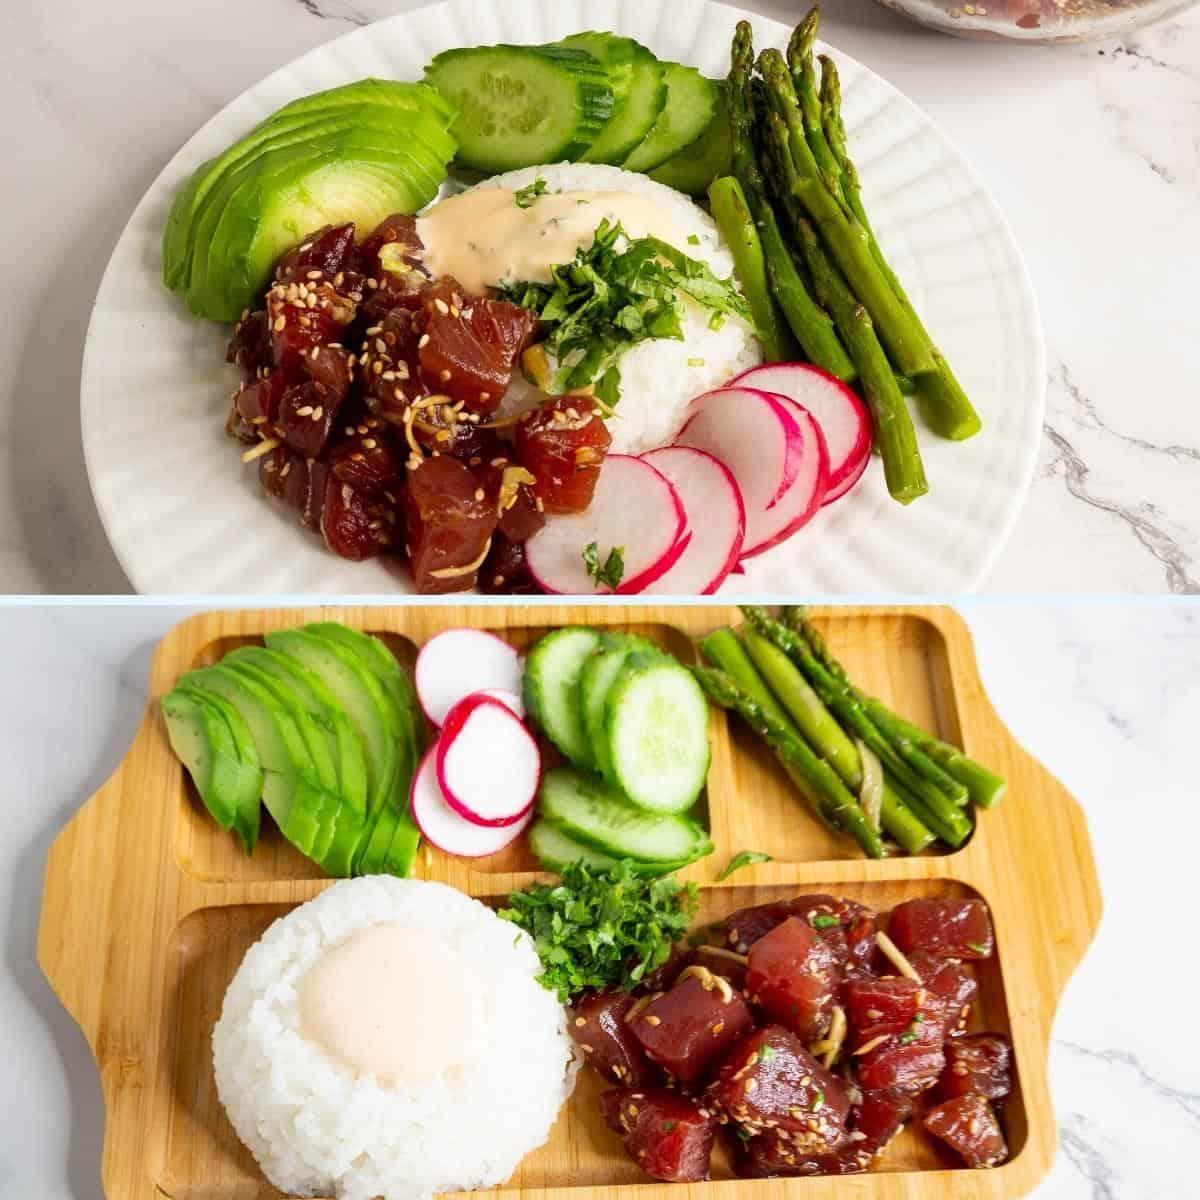 Two bowls with ahi tuna poke over rice.